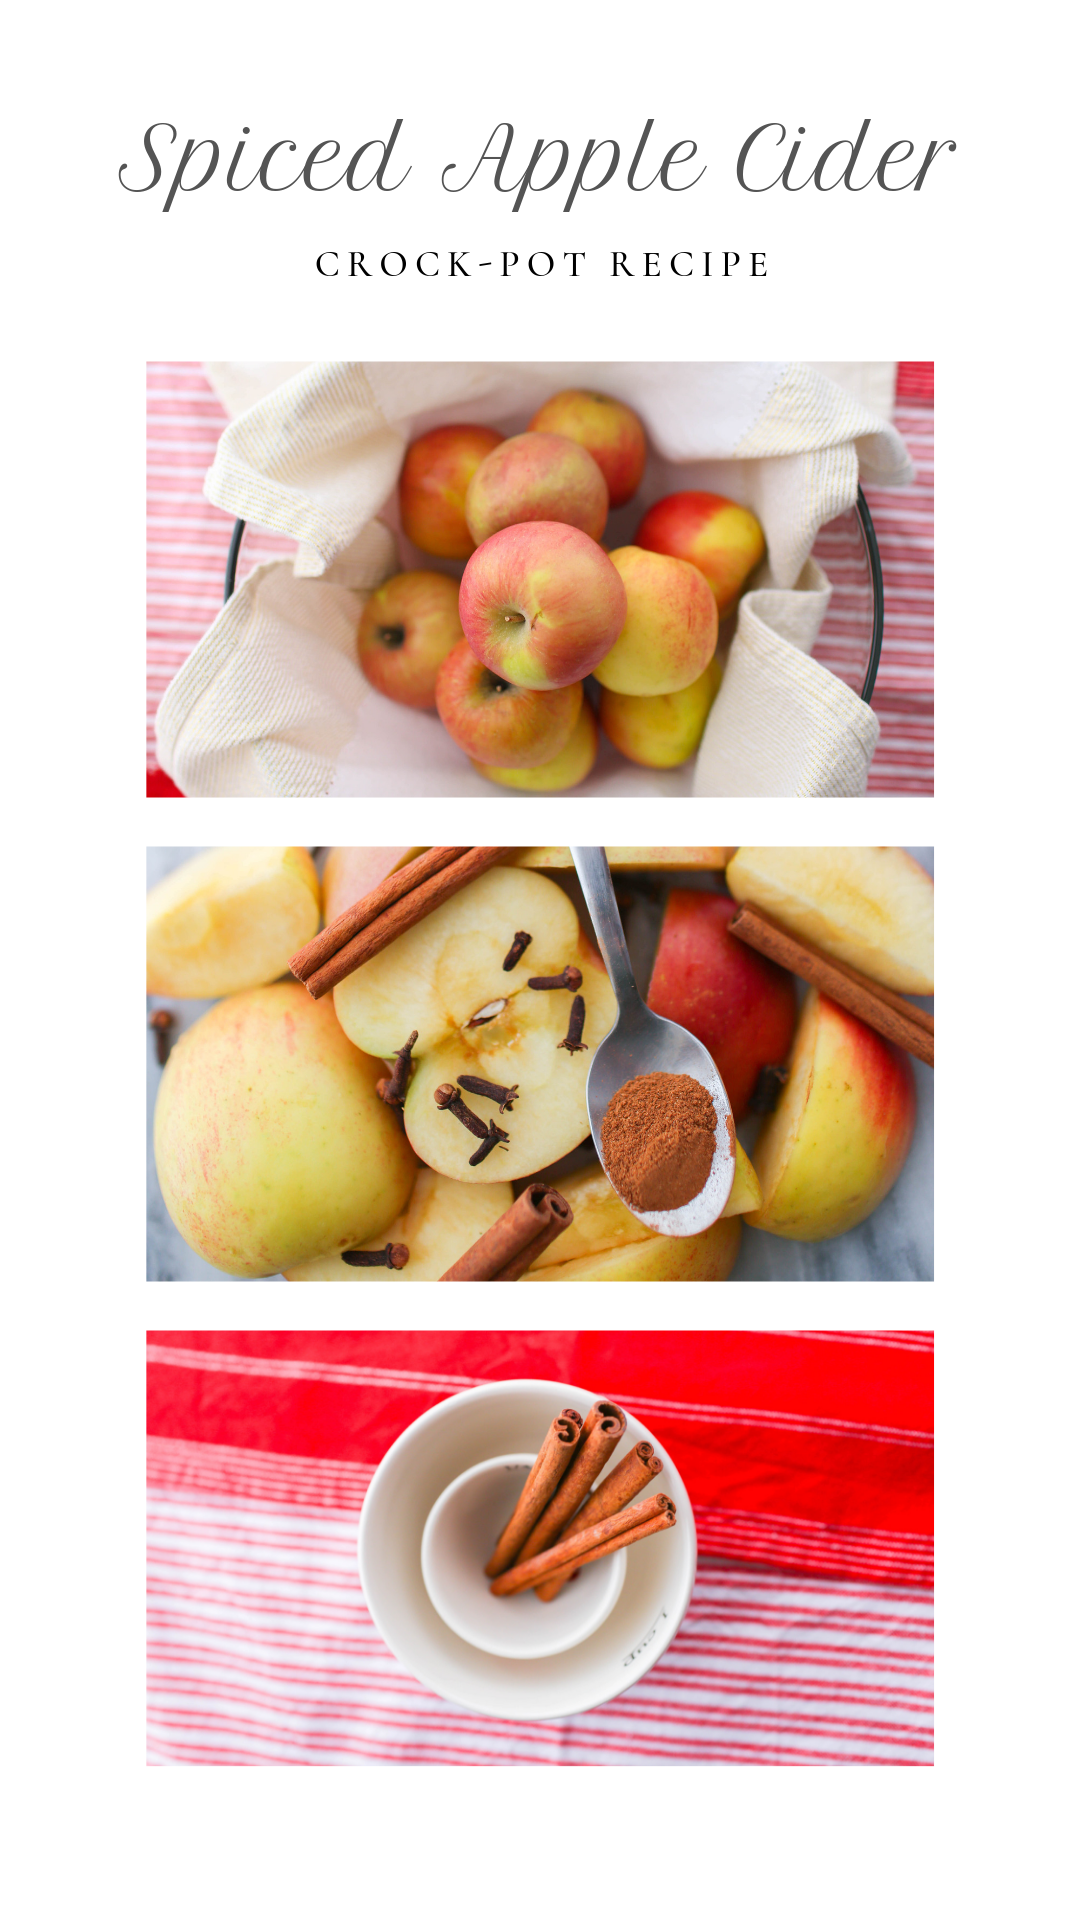 Spiced Apple Cider Slow Cooker Recipe.png